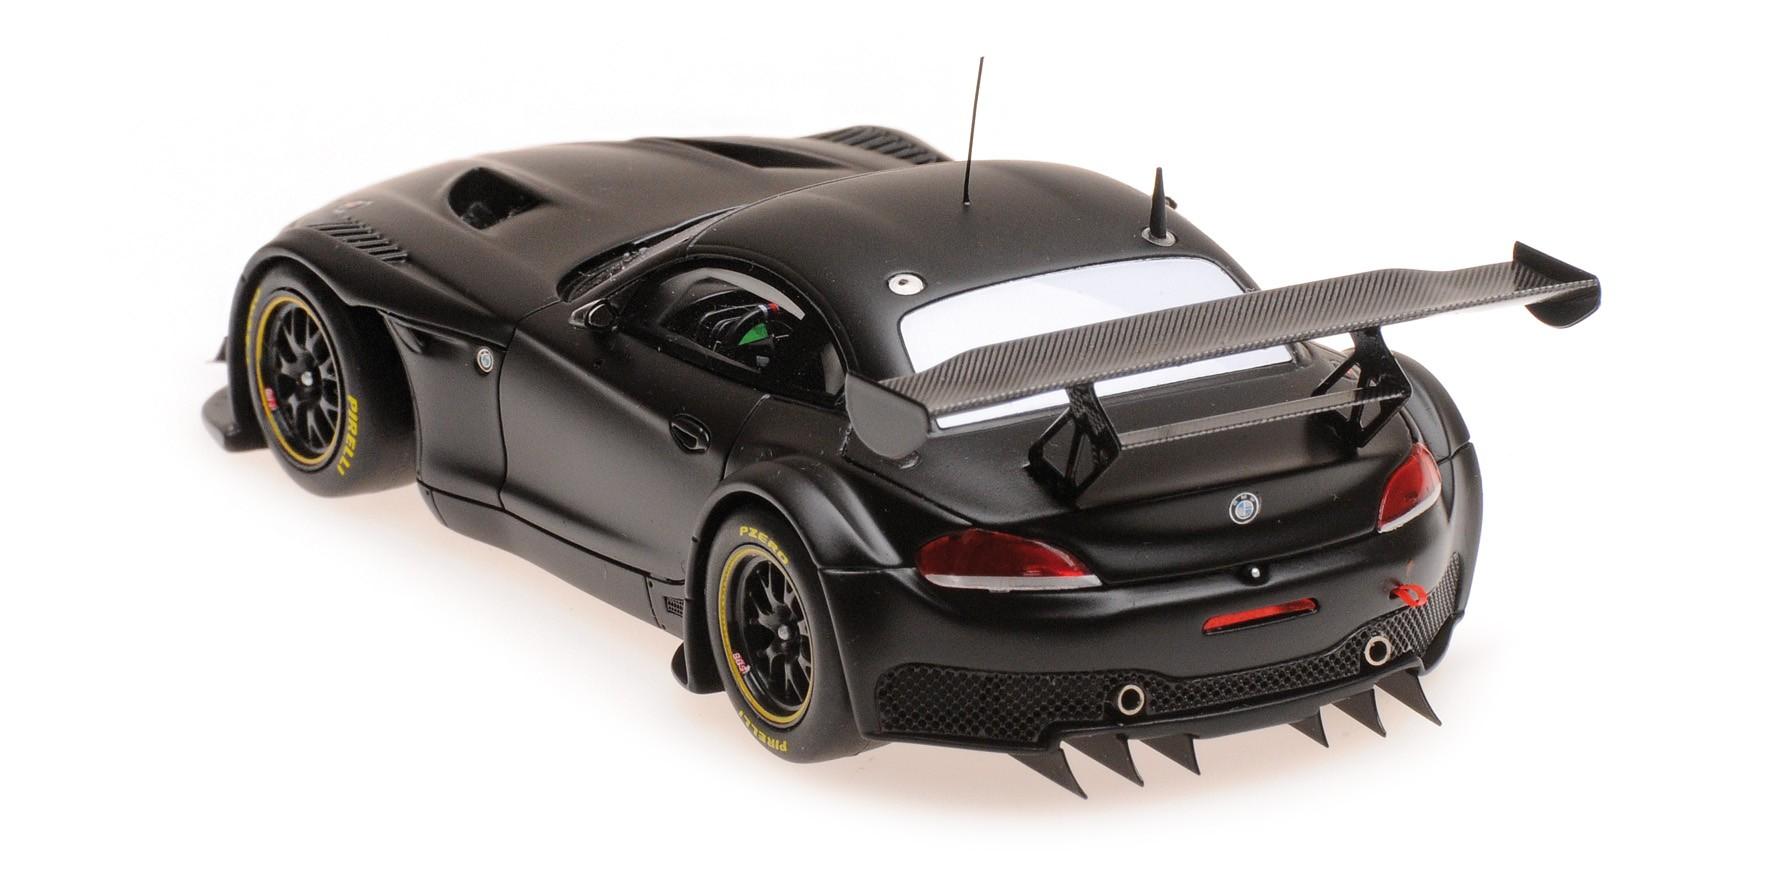 PLAIN BODY Minichamps 1:43 BMW Z4 GT3 SATIN BLACK